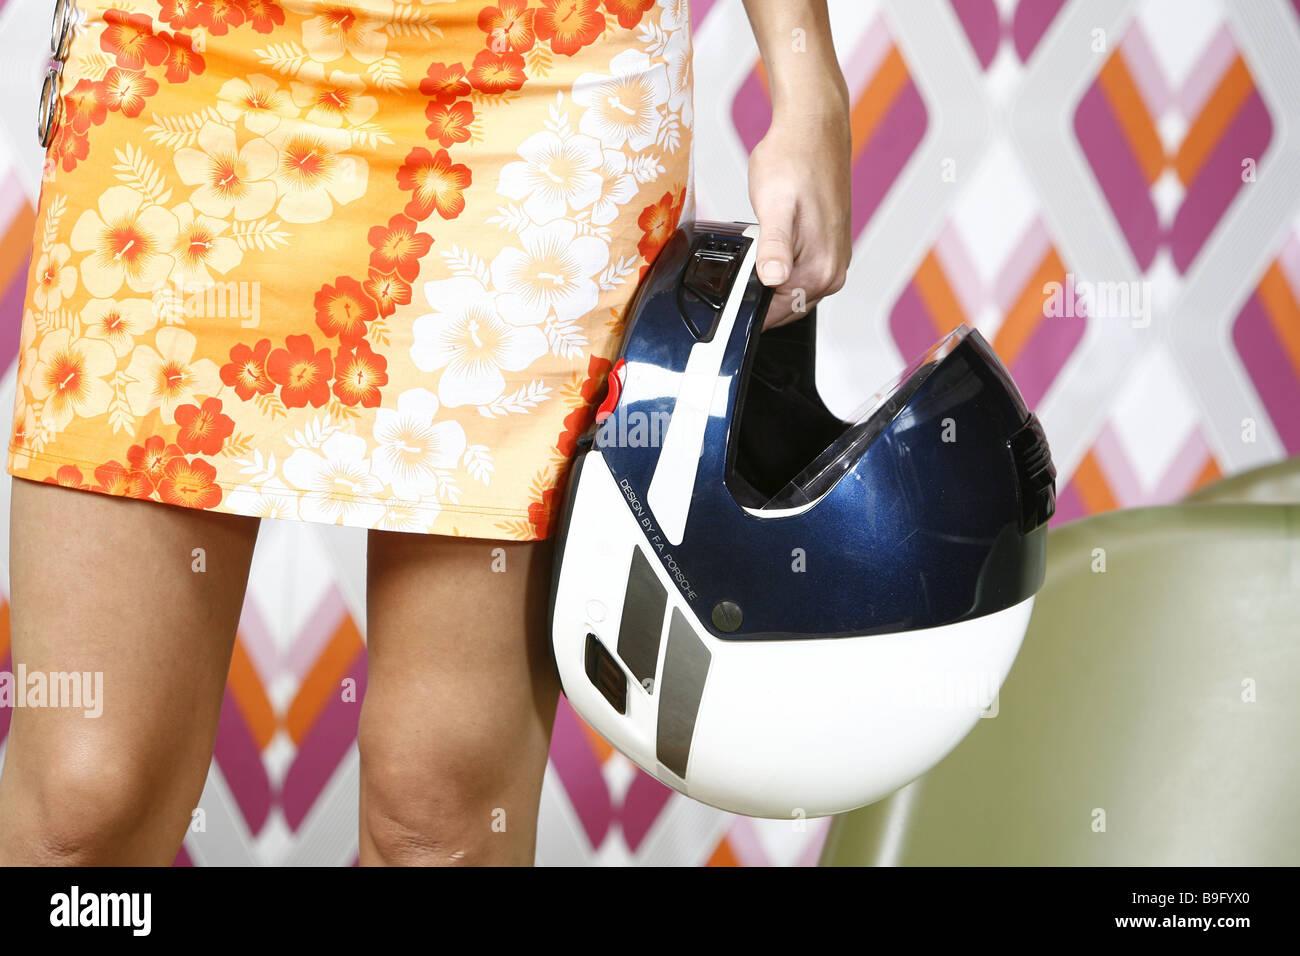 Woman stands miniskirt detail legs hand motorcycle-helmet holding Retro people dress summer-dress helmet carries - Stock Image